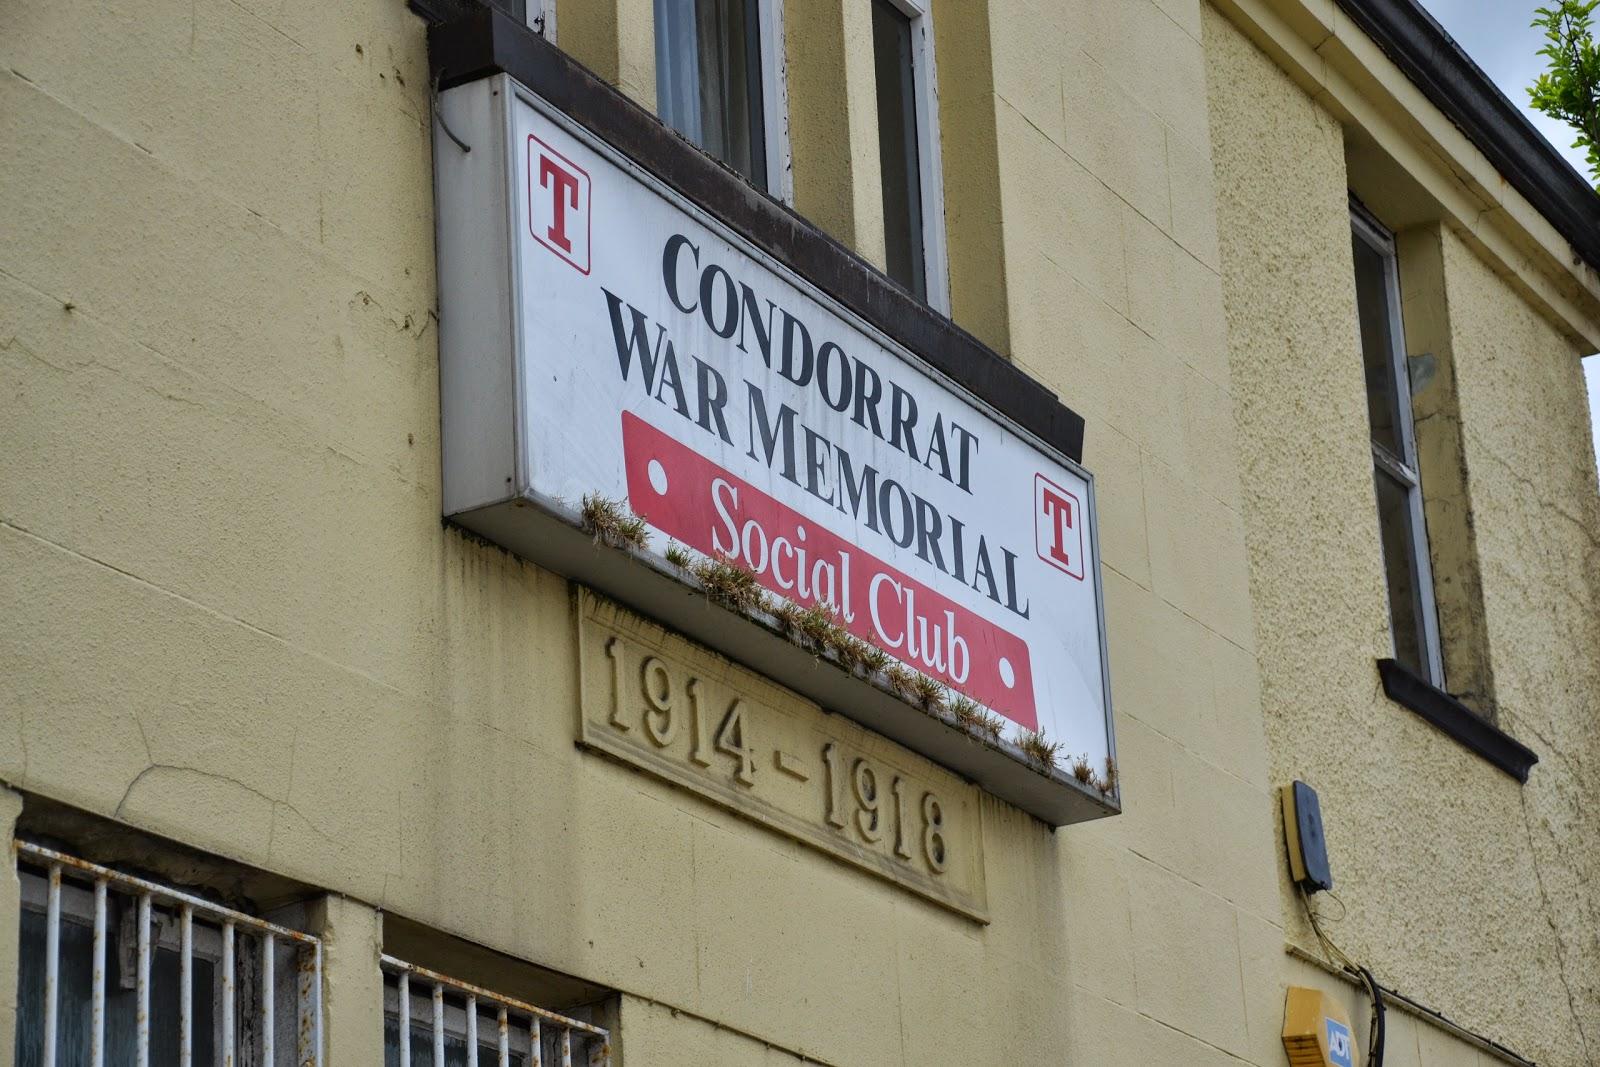 01-06-2013 - By Scott Campbell (+44) 0774 296 870 - Condorrat Gala Day, 2013, at St. Helen's Primary School; Picture shows Condorrat War Memorial Social Club, on Condorrat Main Road.